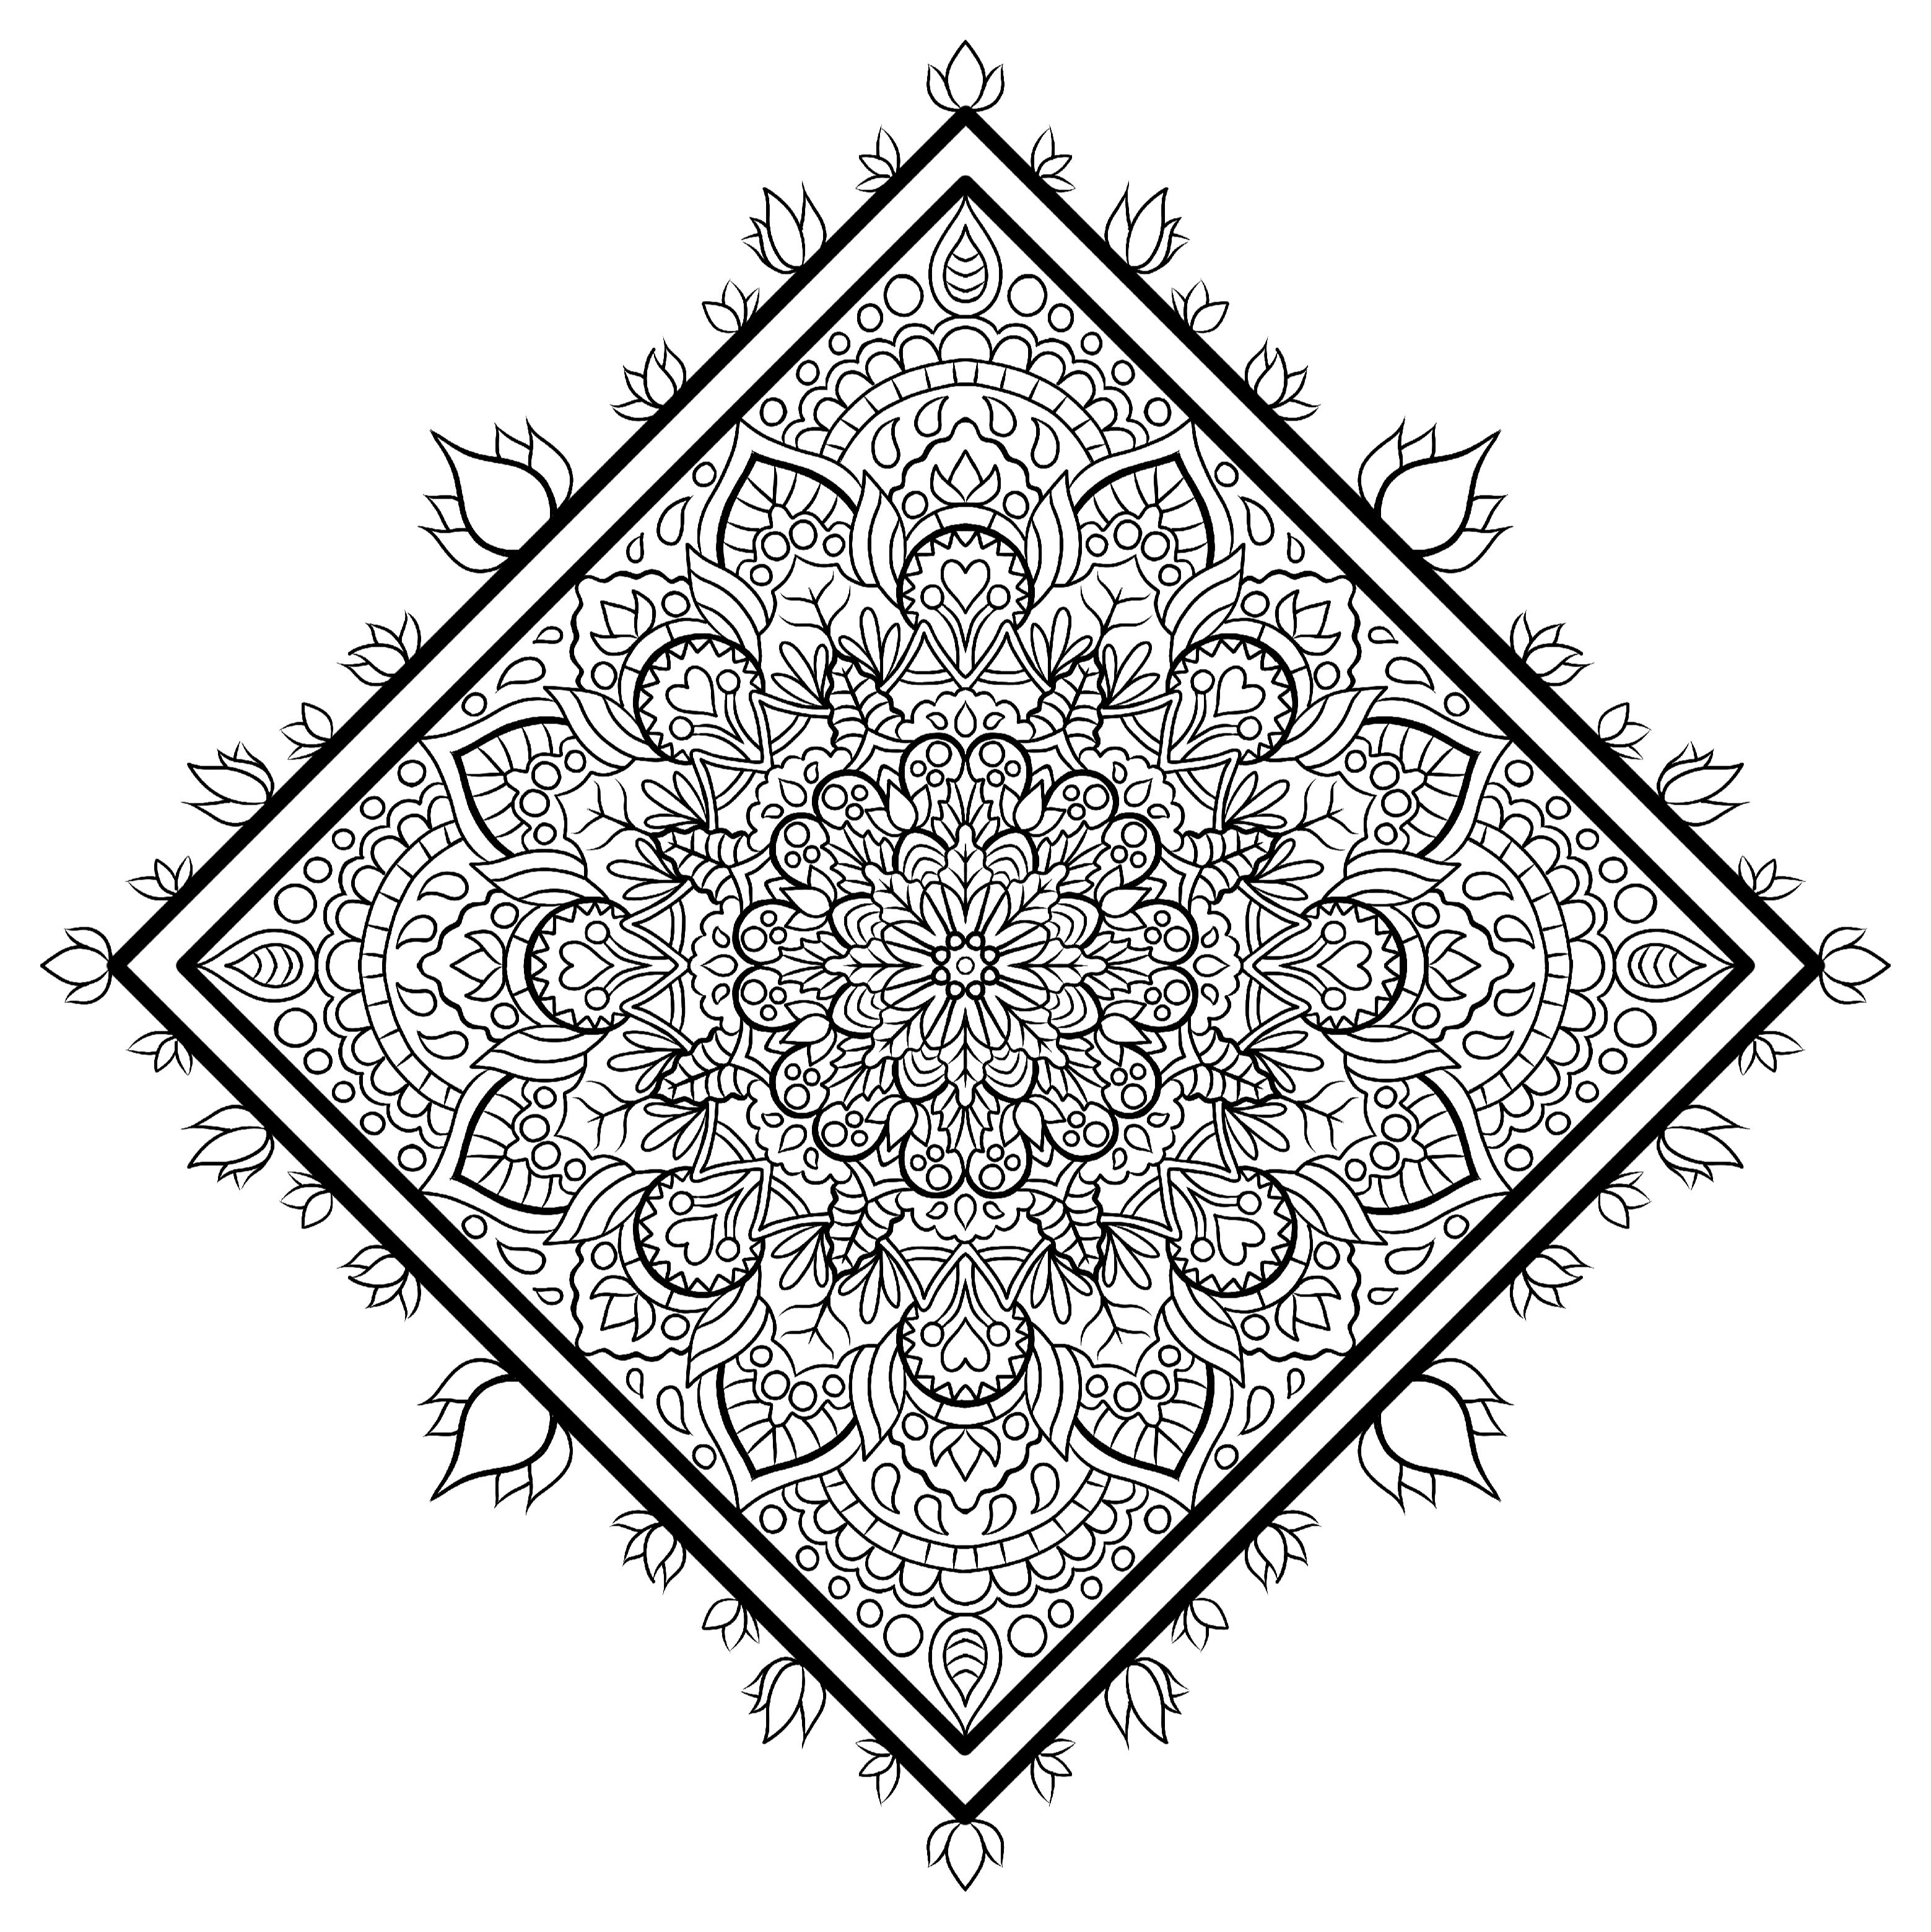 Square Mandala Colouring Page